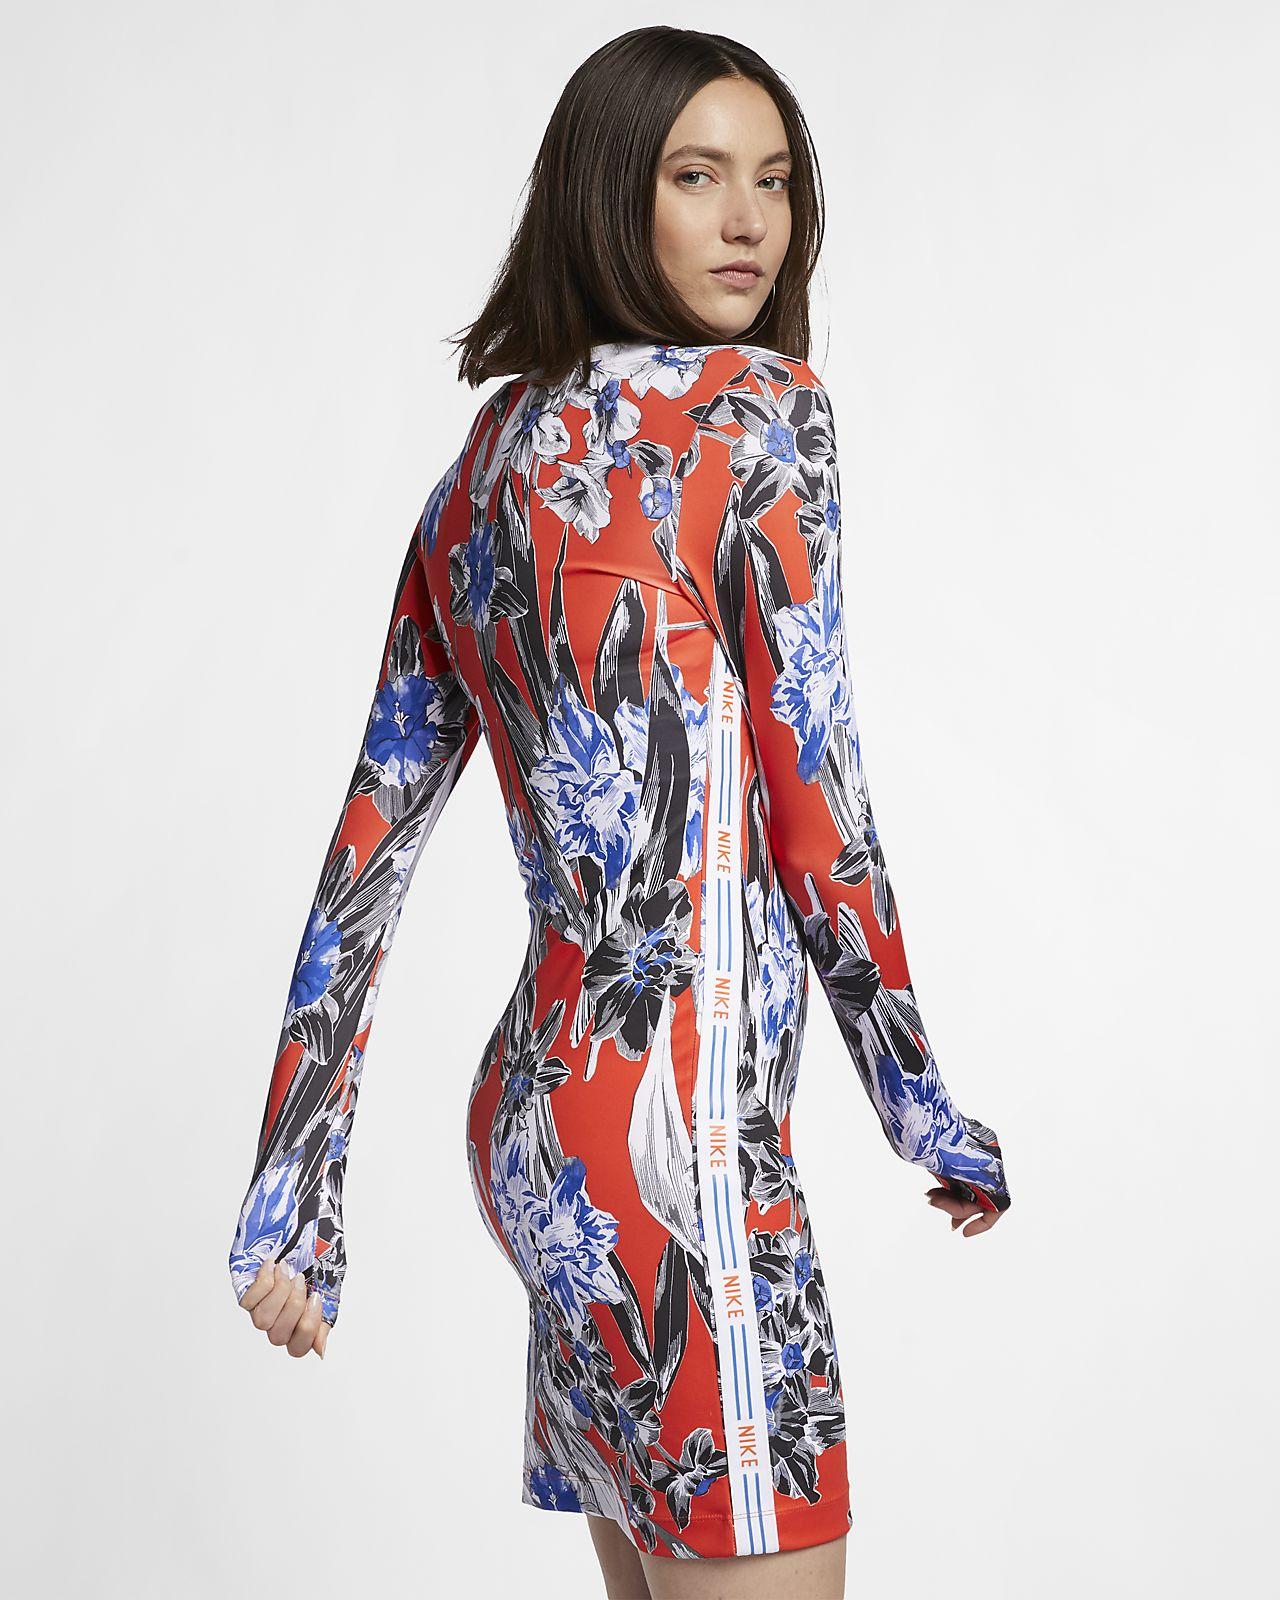 2a6ae231bdf Nike Sportswear Women s Long-Sleeve Floral Dress. Nike.com